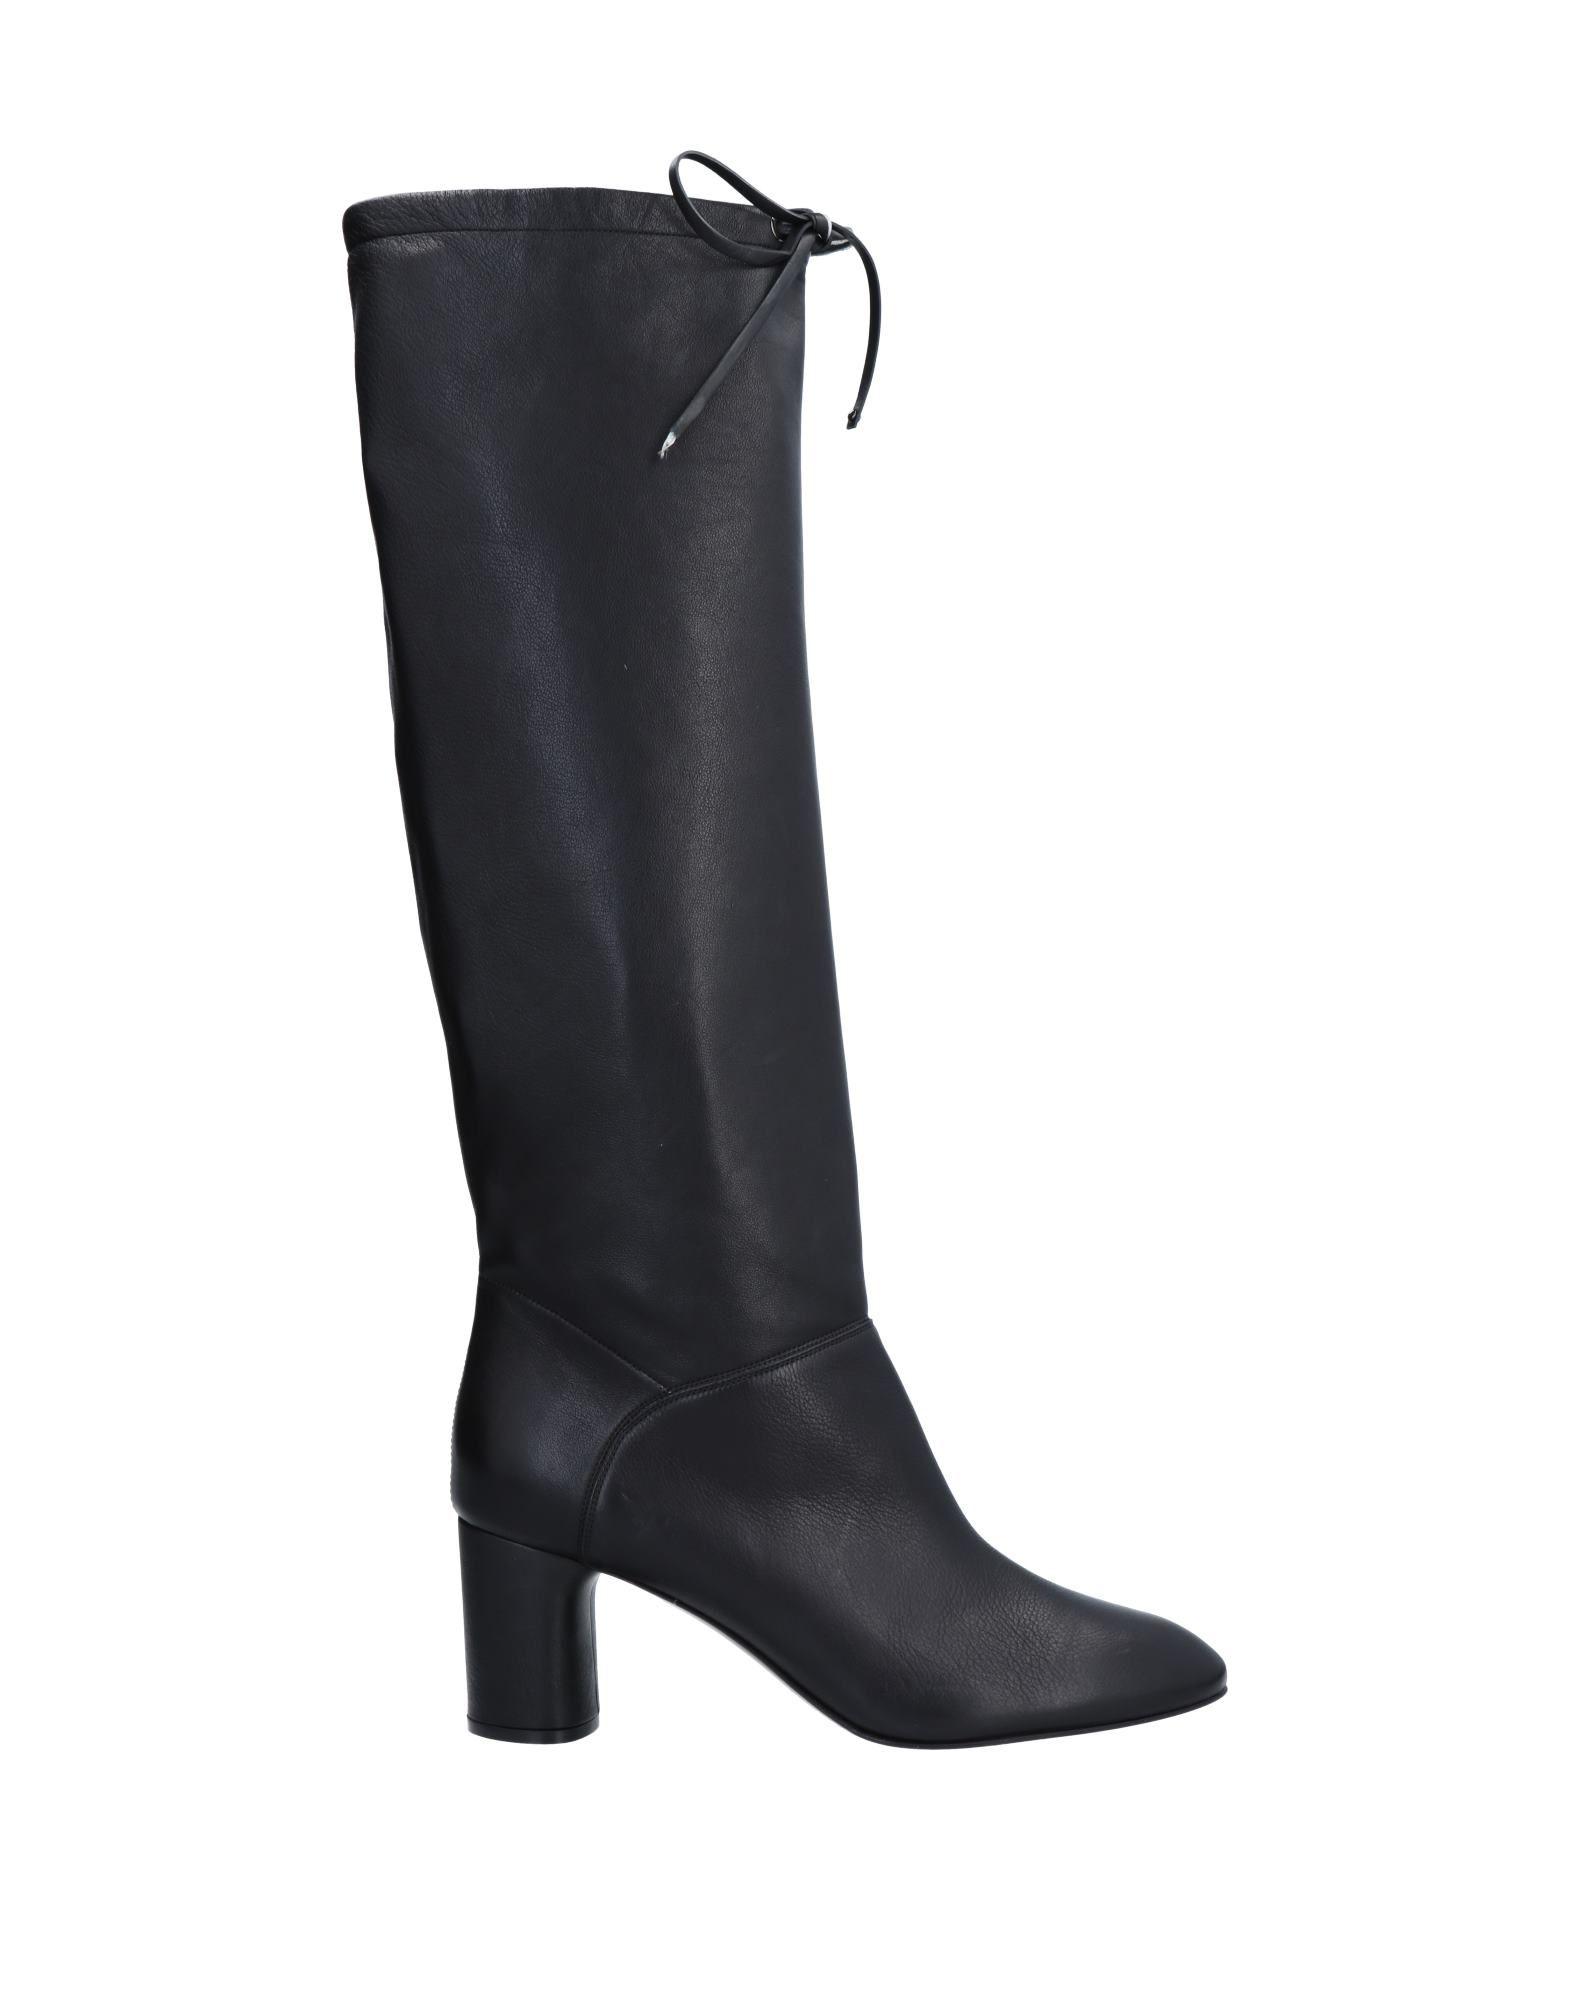 Casadei Boots - Women Casadei Boots online on 11321766SN  United Kingdom - 11321766SN on 443c80